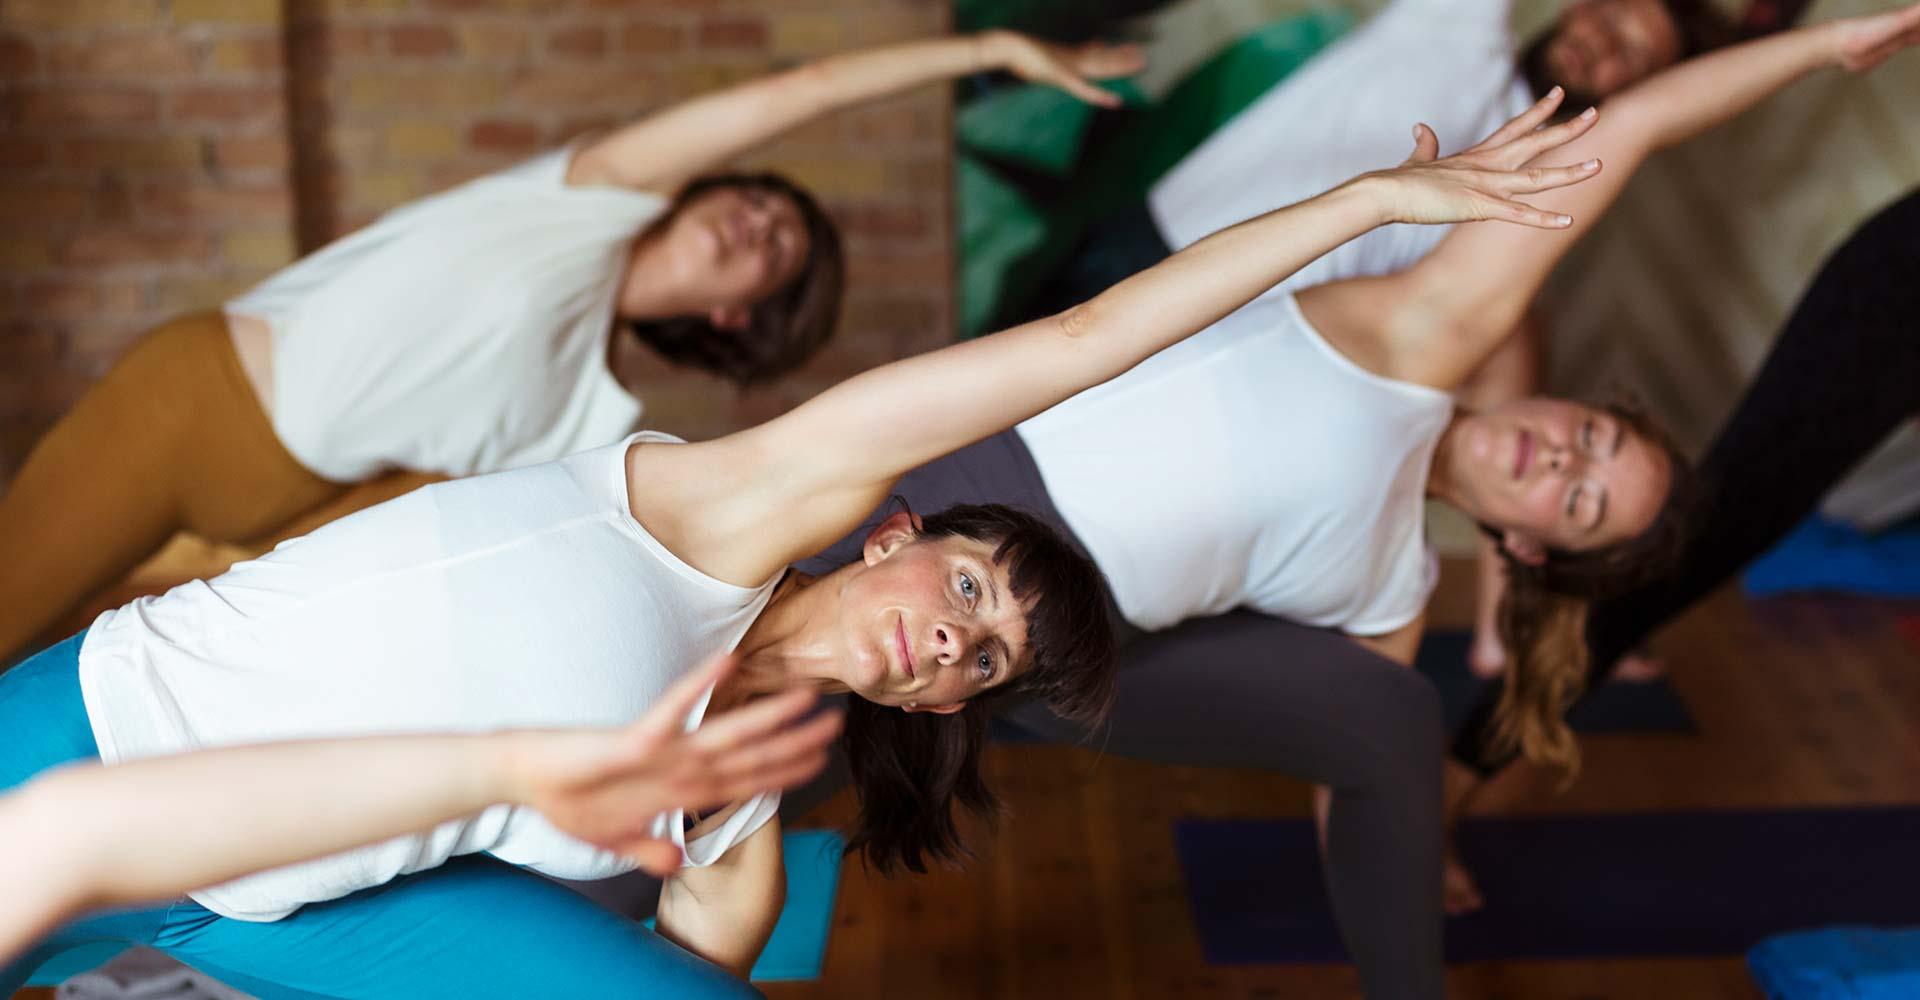 yogafürdich Power Vinyasa Flow Yoga Berlin